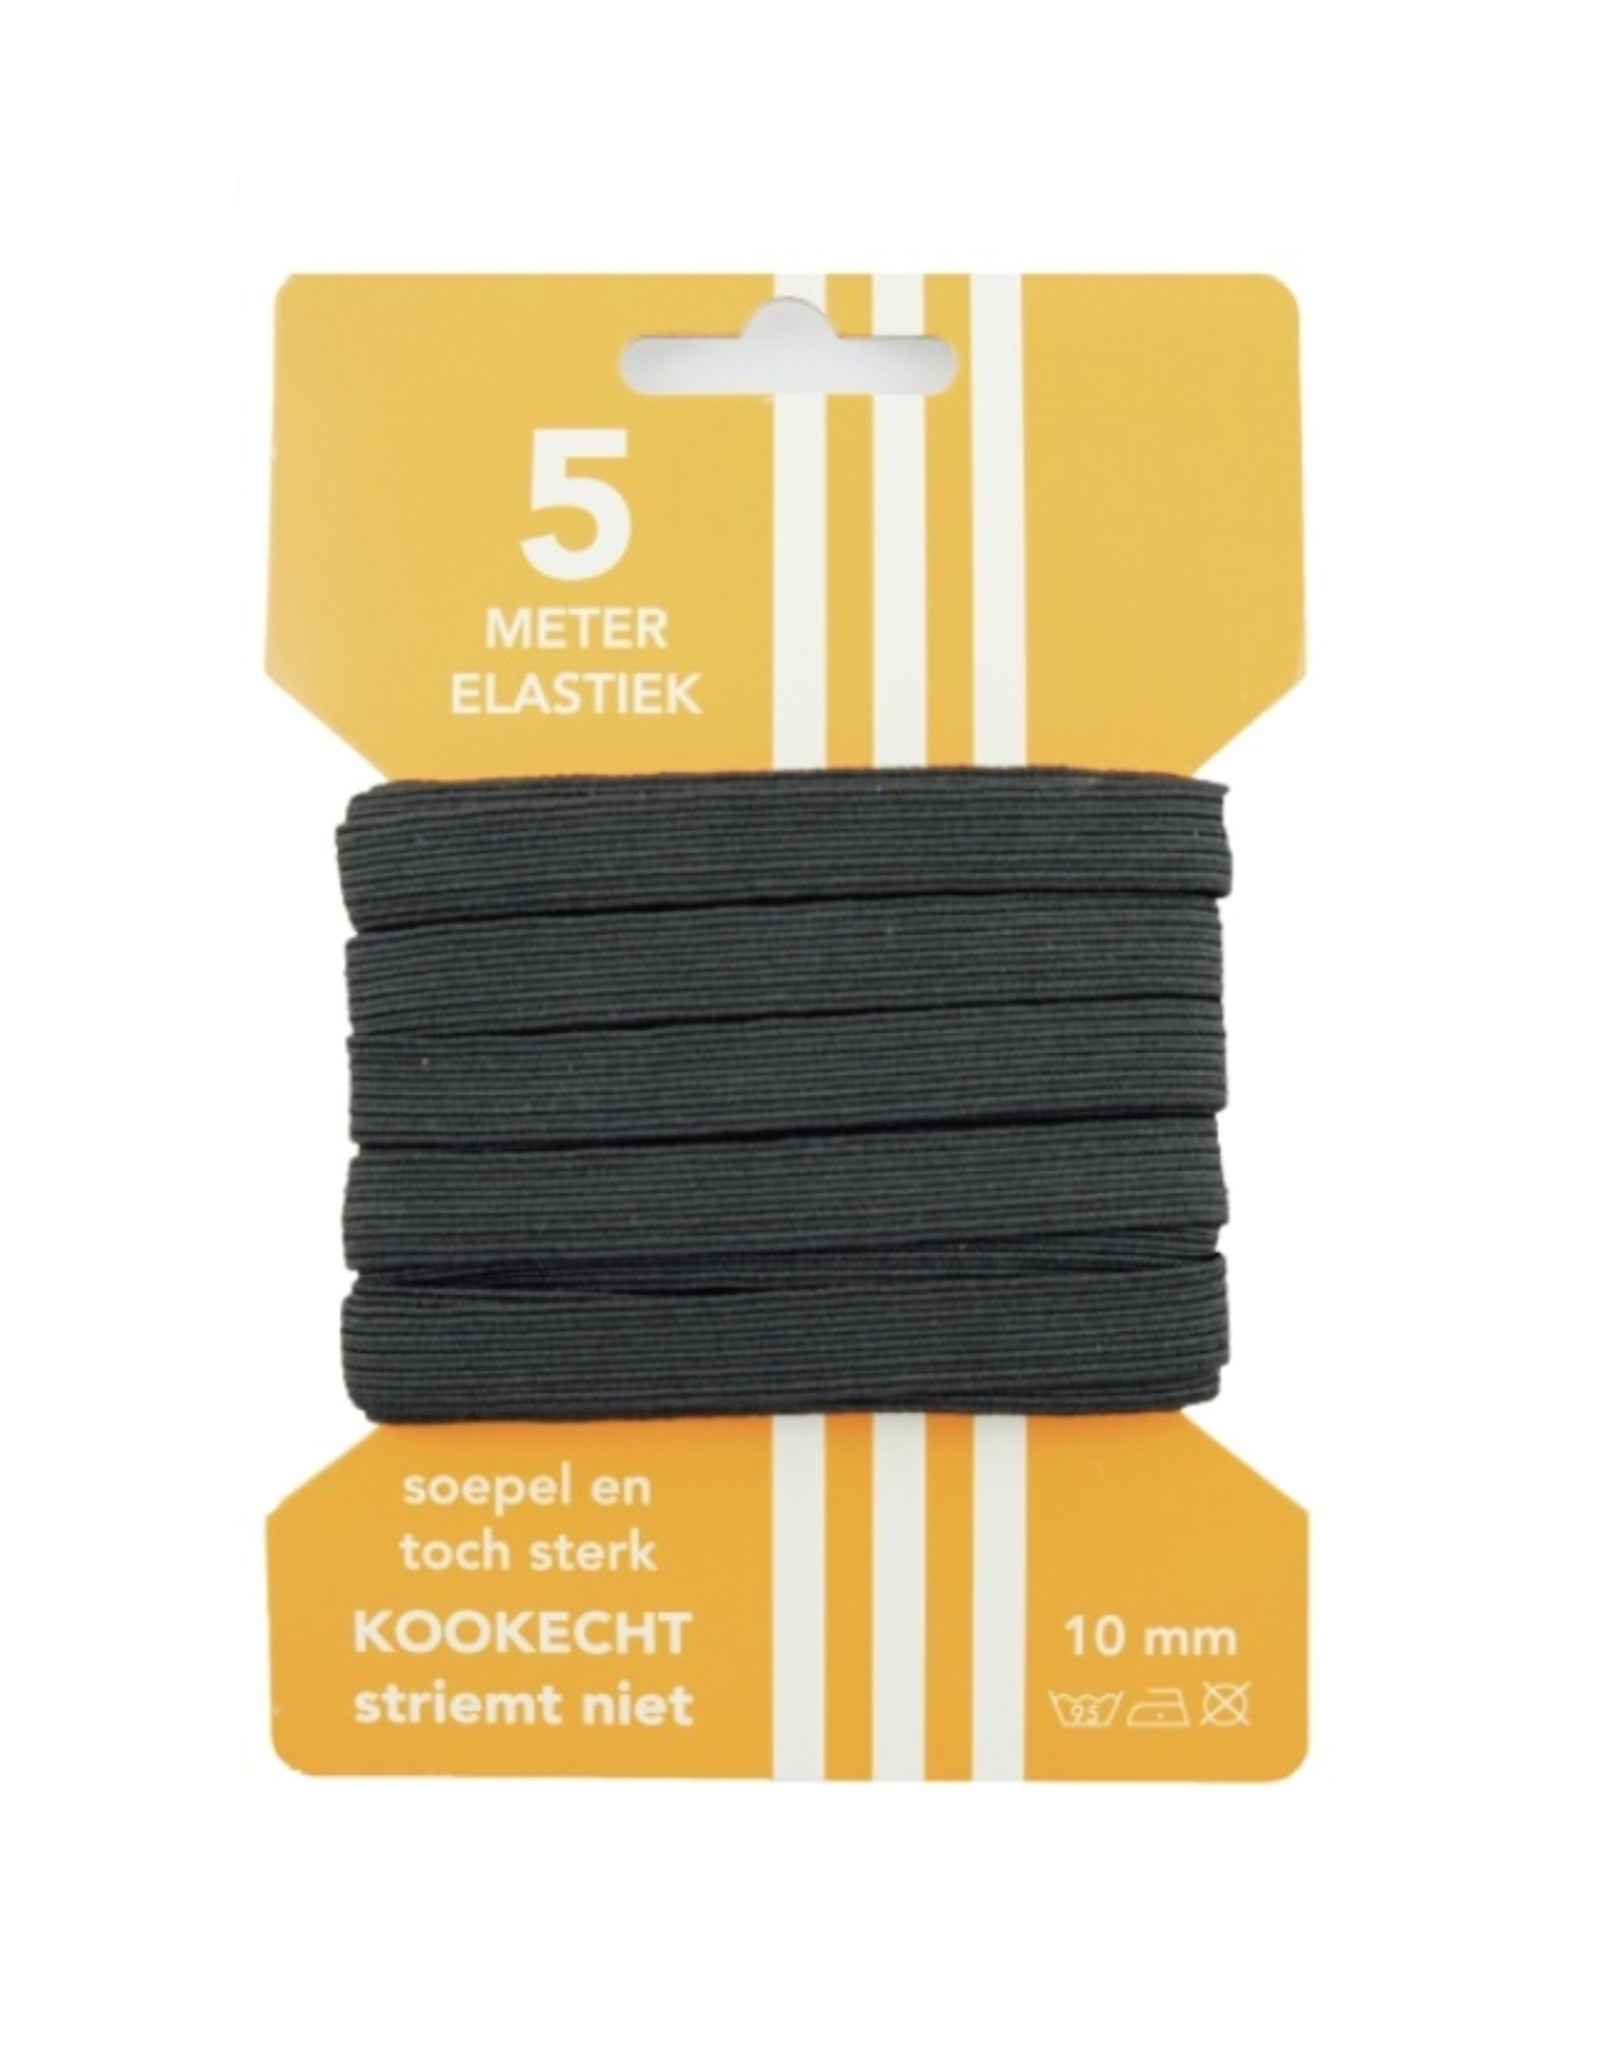 5 m Cart elastic black 10 mm